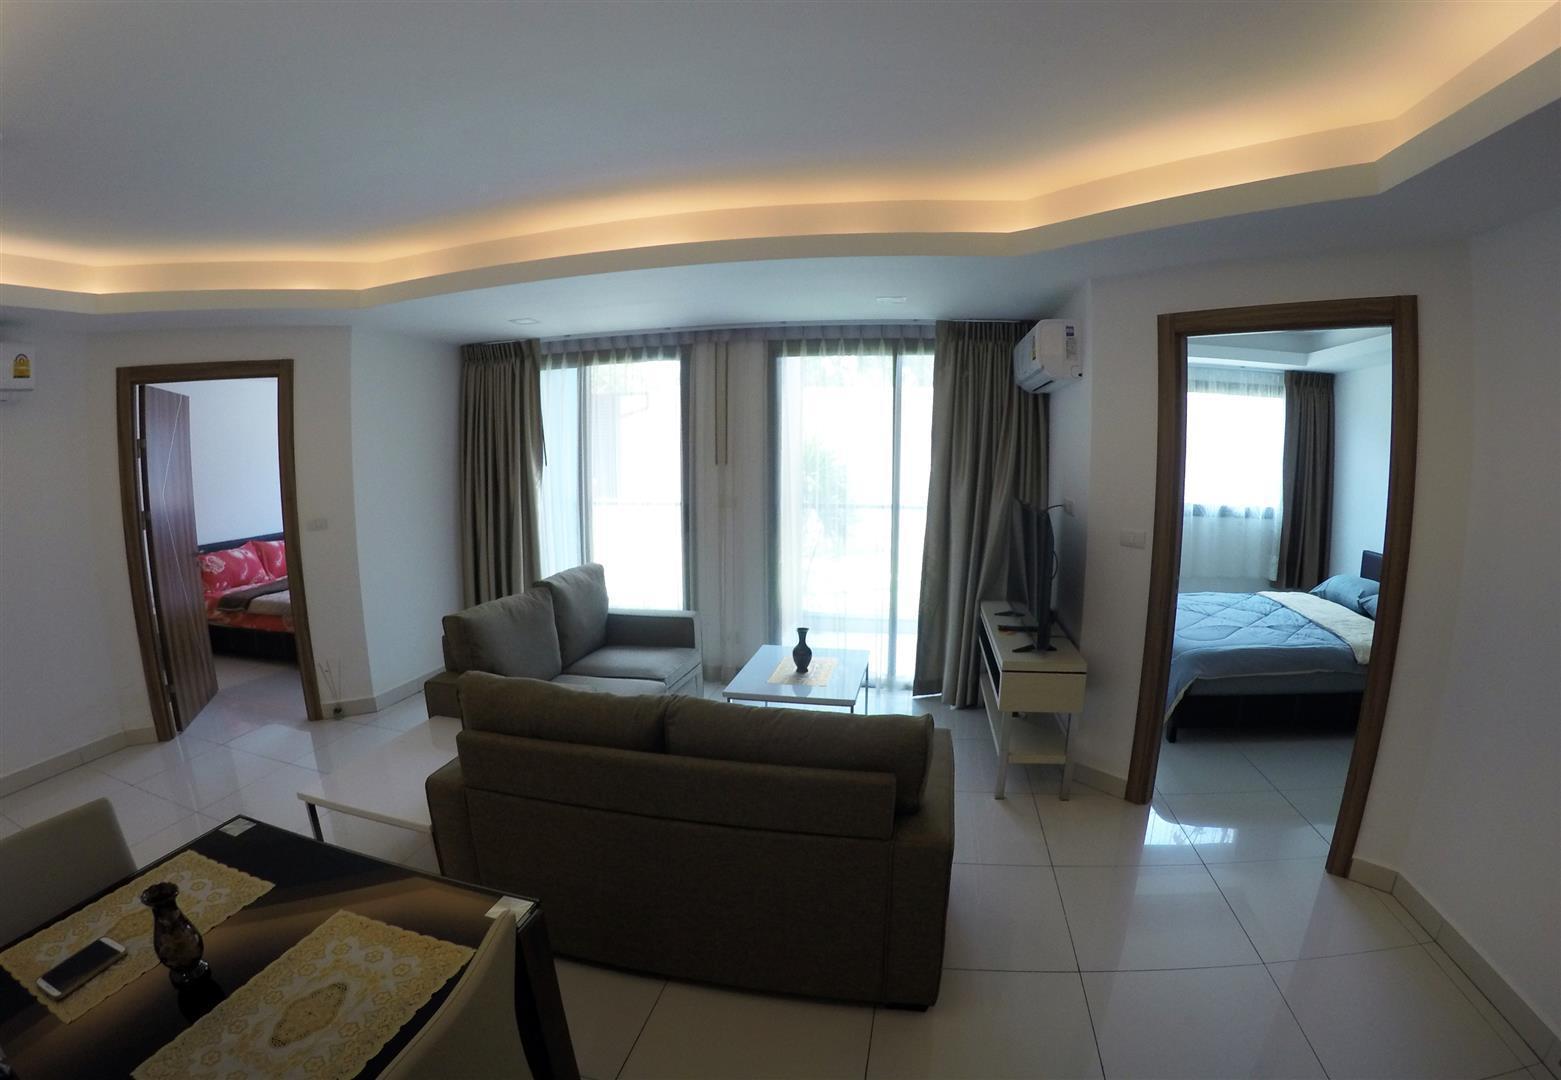 2 BR Laguna Beach Resort II Condo WiFi Free